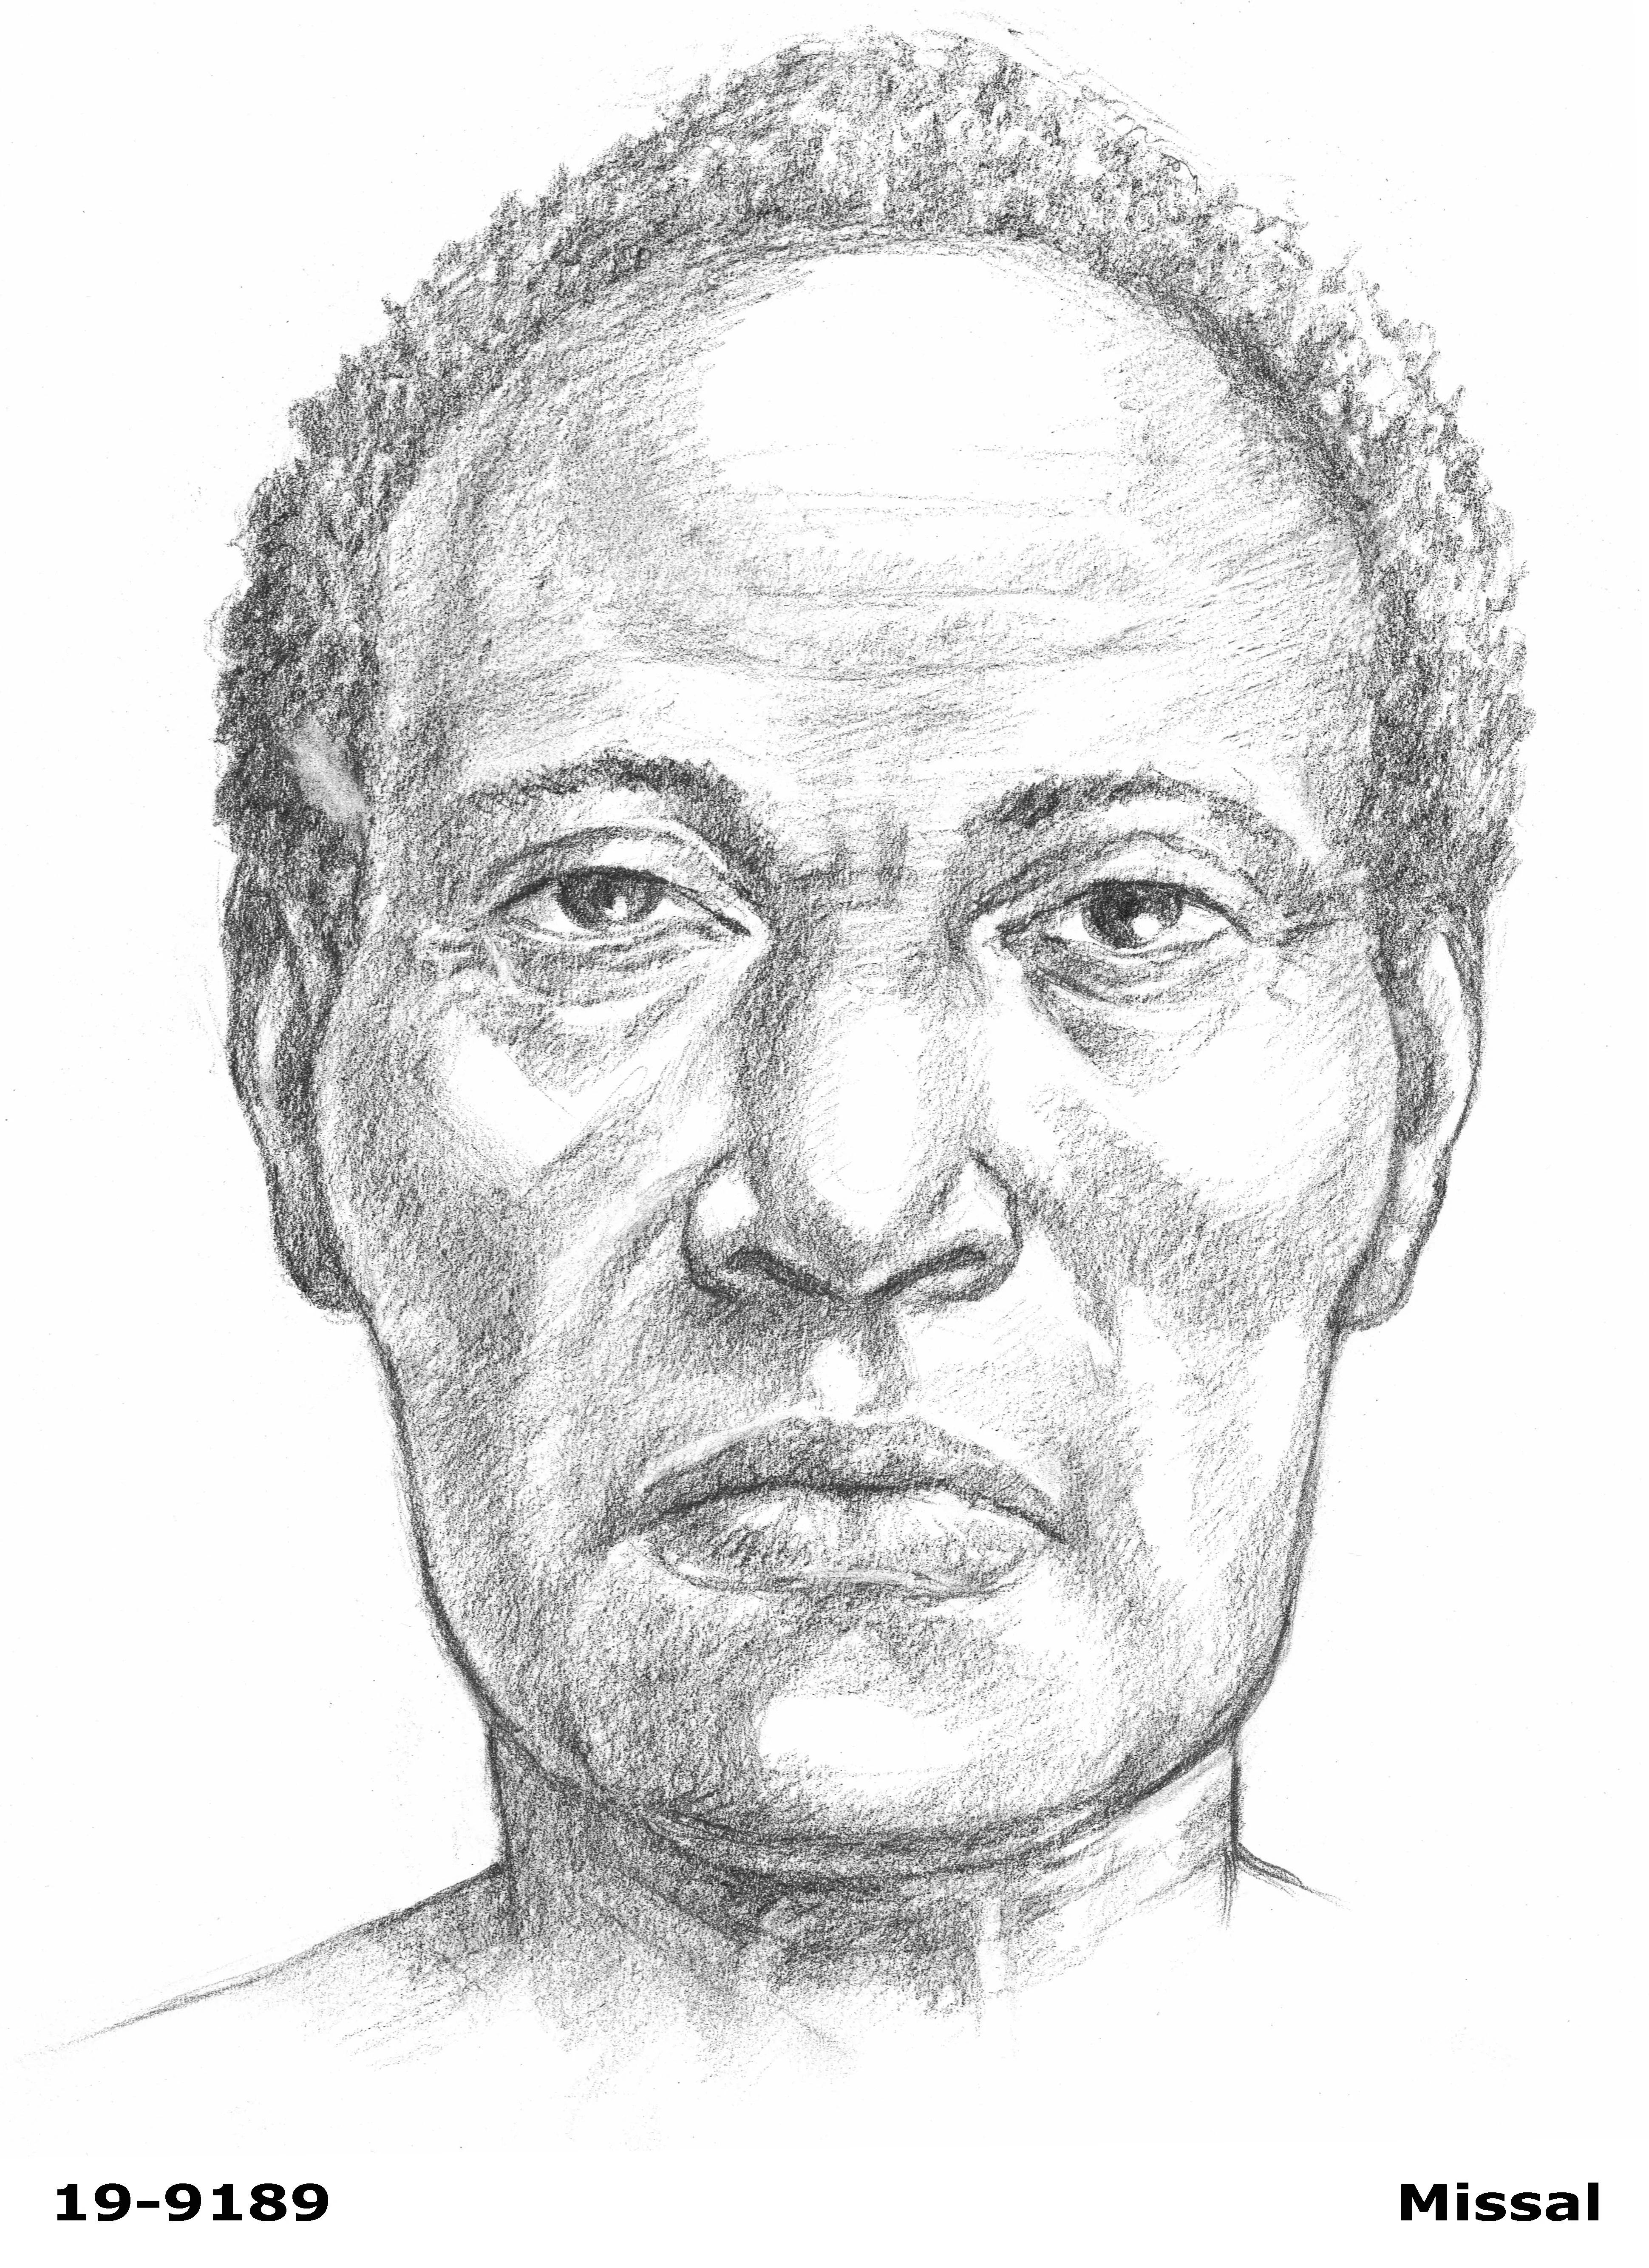 Phoenix John Doe (October 2019)